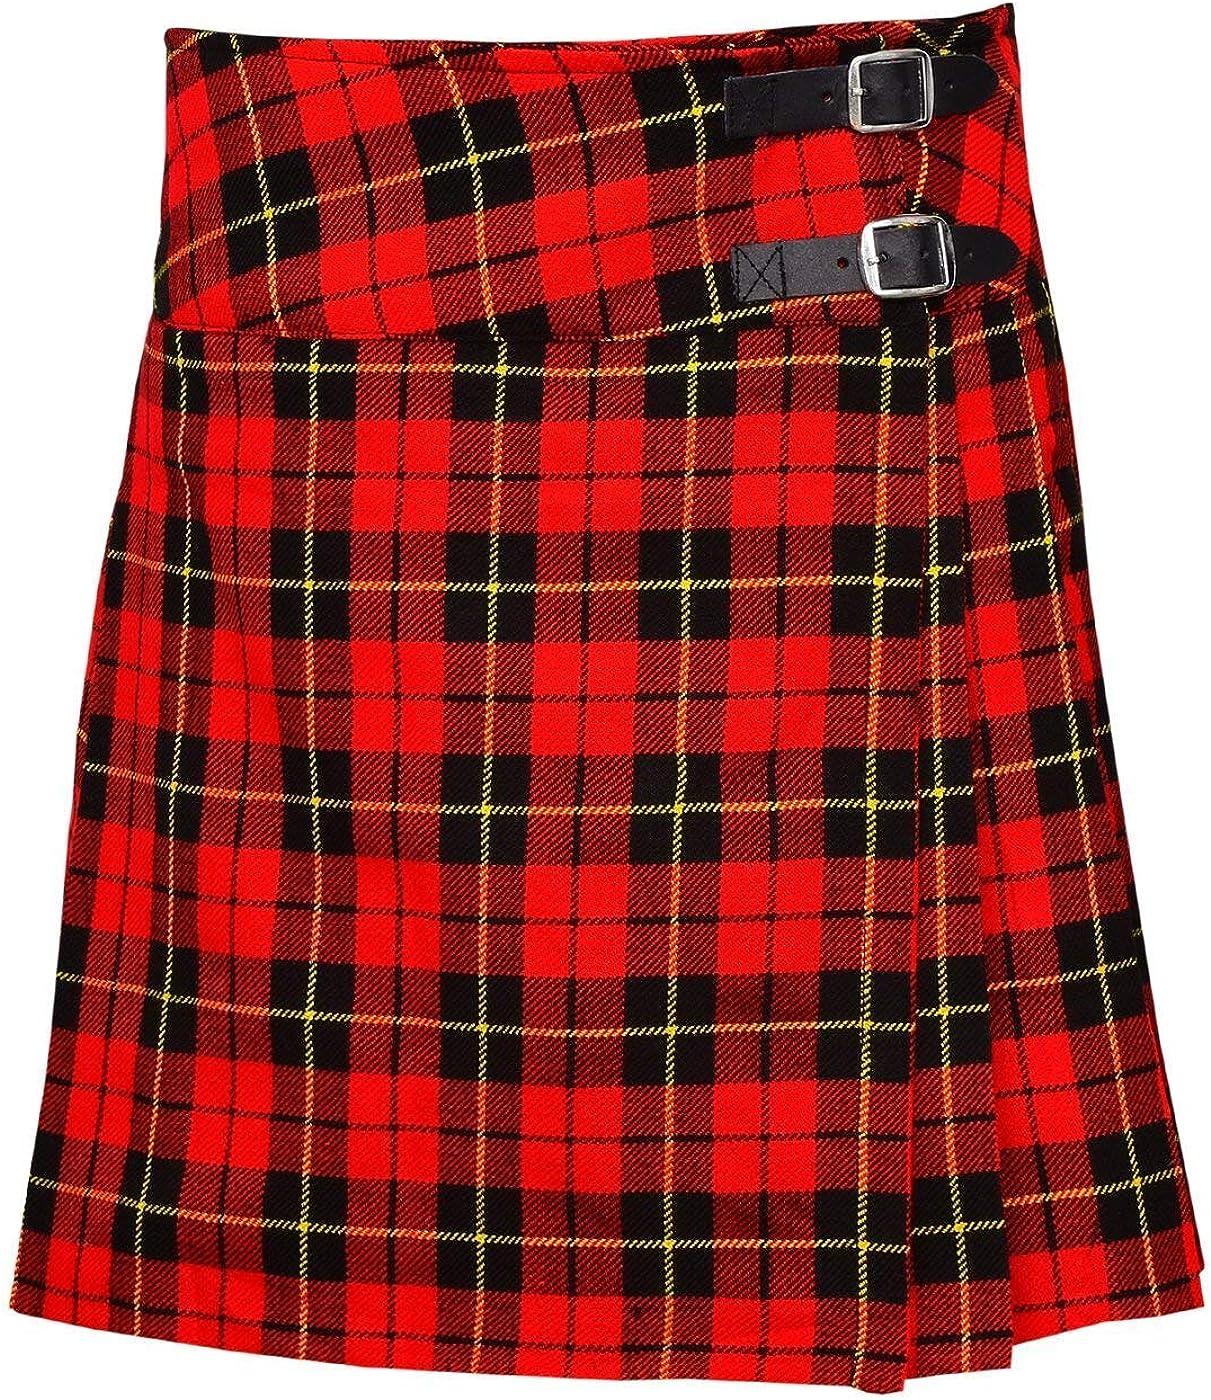 SHYNE/_ENTERPRISES Ladies Knee Length Kilt Skirt 20 Length Tartan Pleated Kilts Wallace